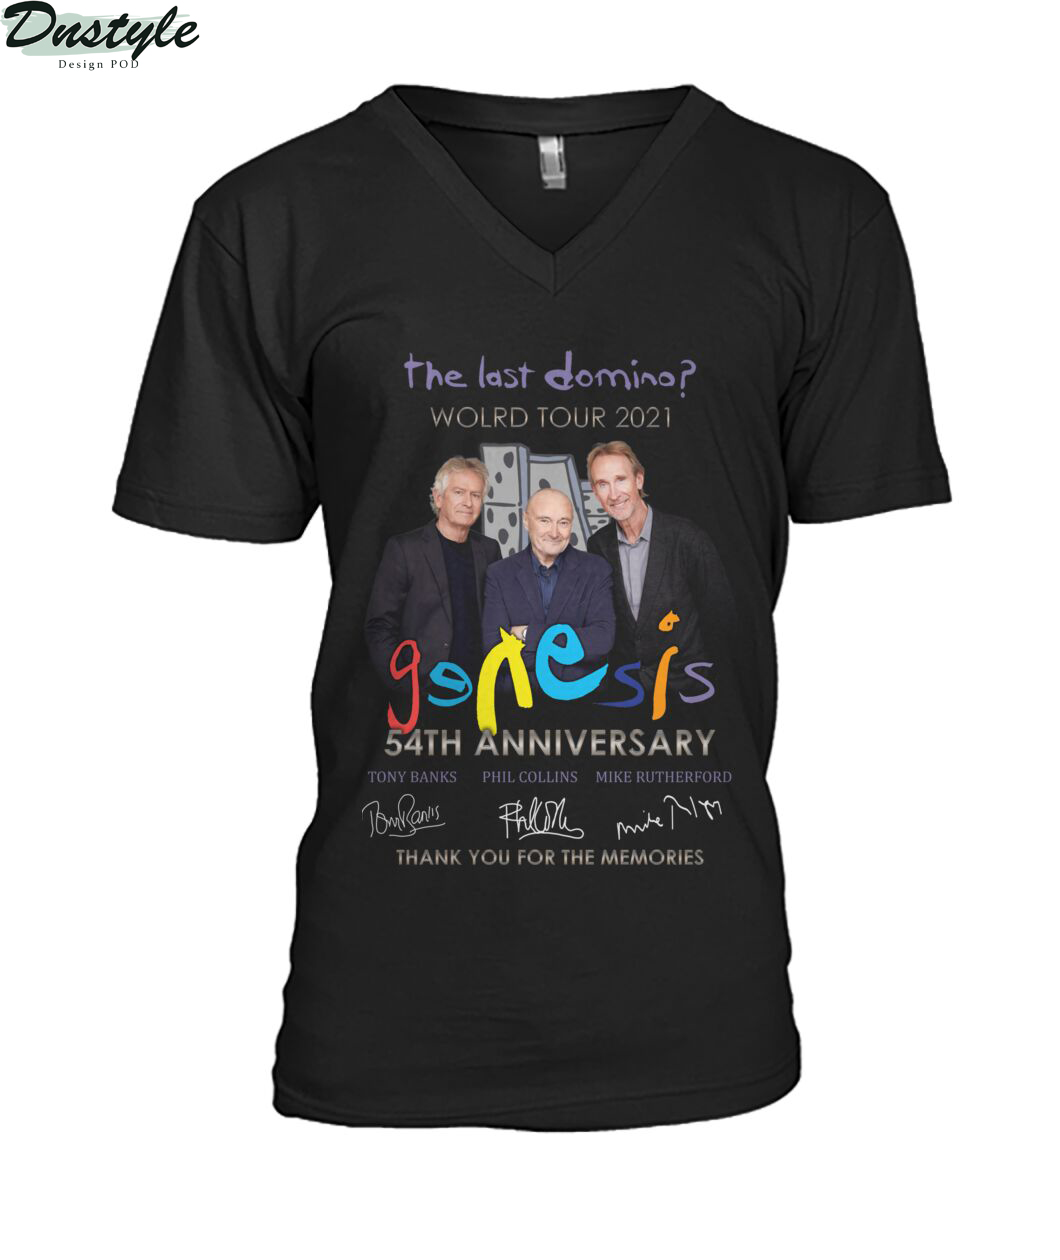 The last domino world tour 2021 Genesis 54th anniversary v-neck